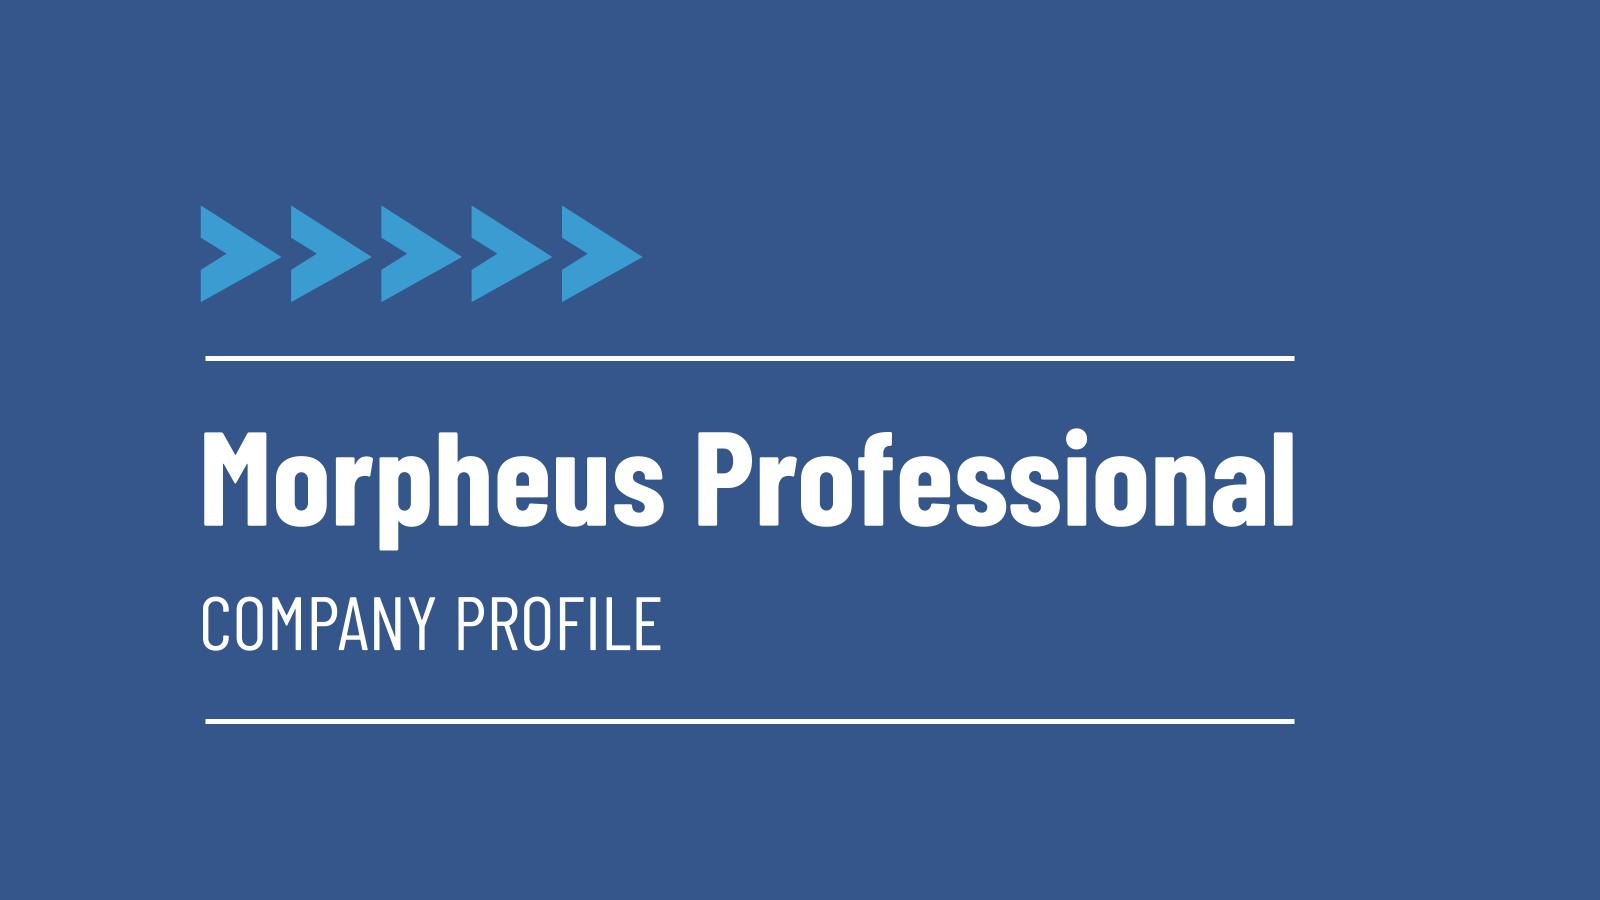 Morpheus Professional company profile presentation template